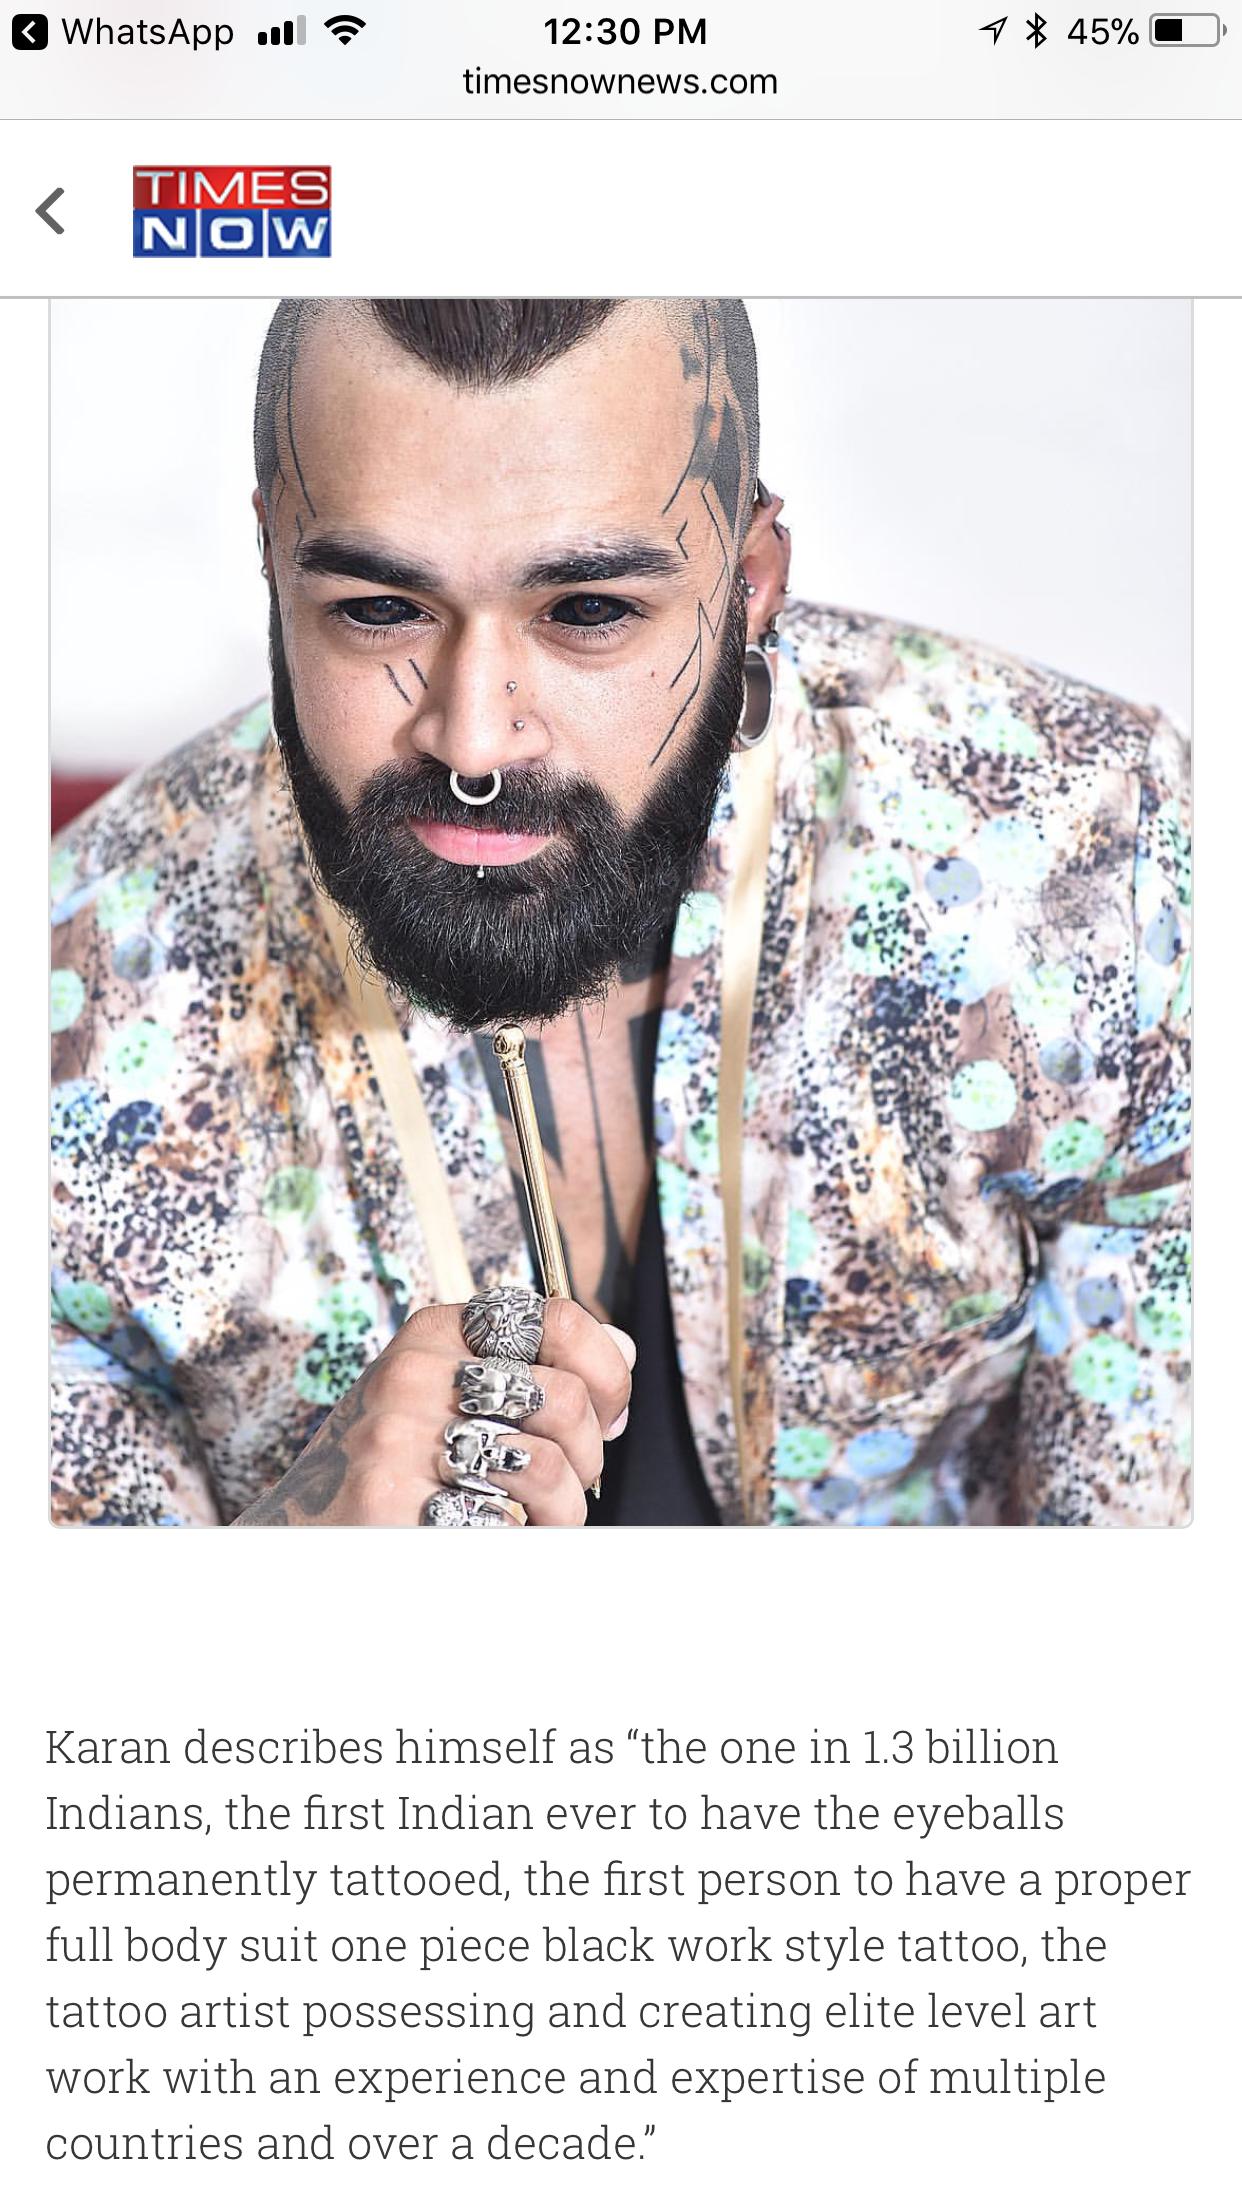 First Indian to get eye balls tattooed, Indian tattoo artist